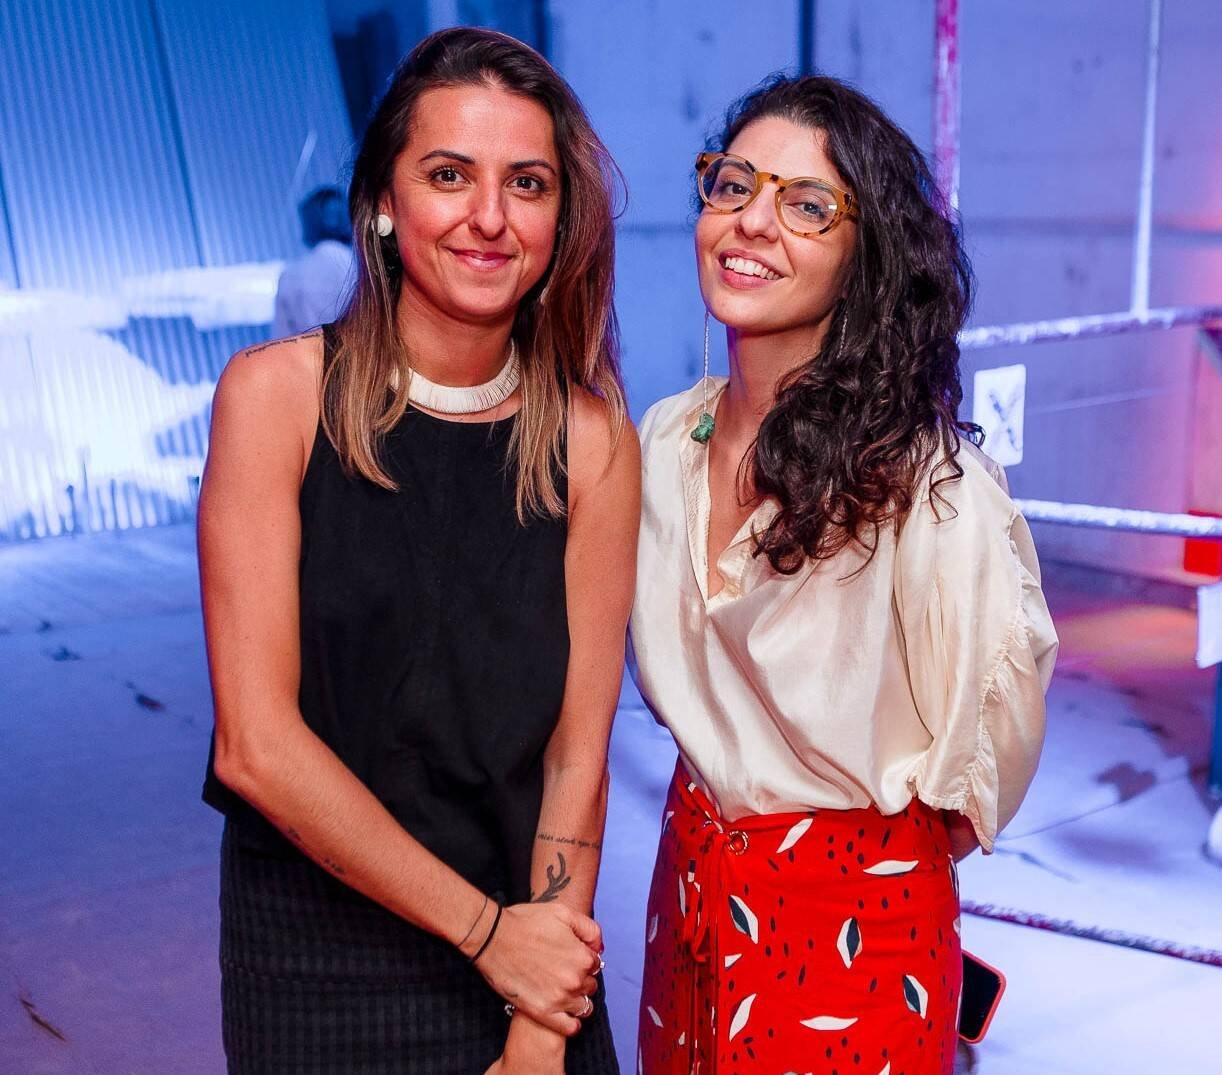 Luciana Moraes e Raphaela Varcalla  /Foto: Bruno Ryfer